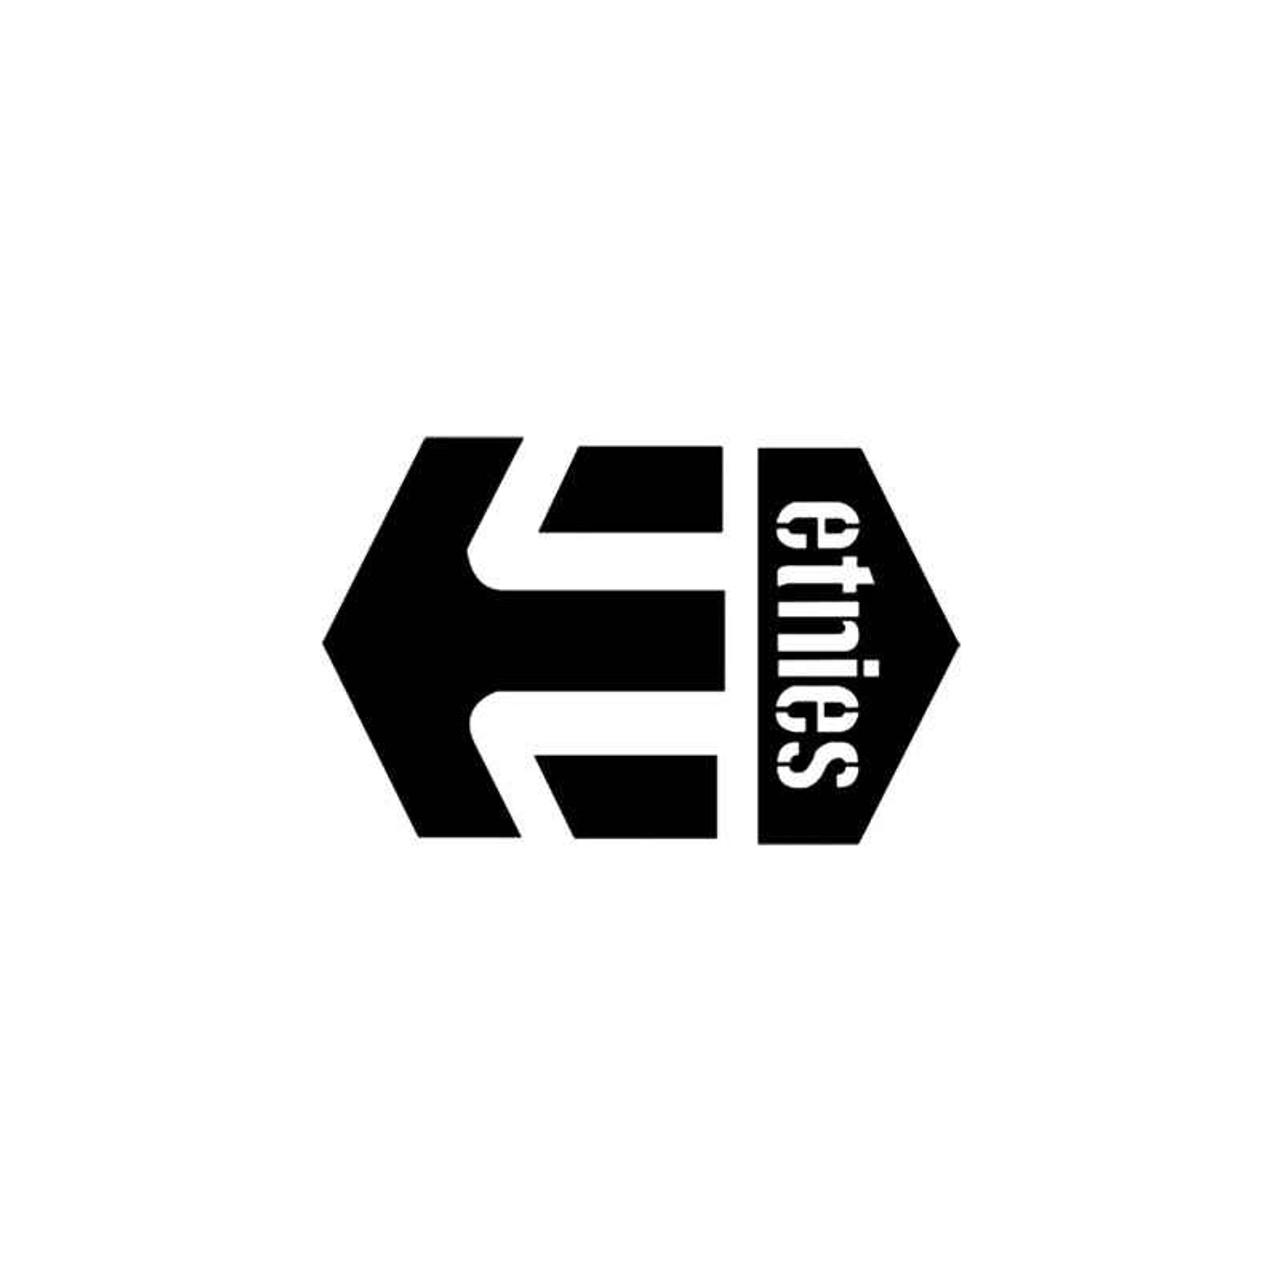 corporate logo s etnies style 1 vinyl sticker